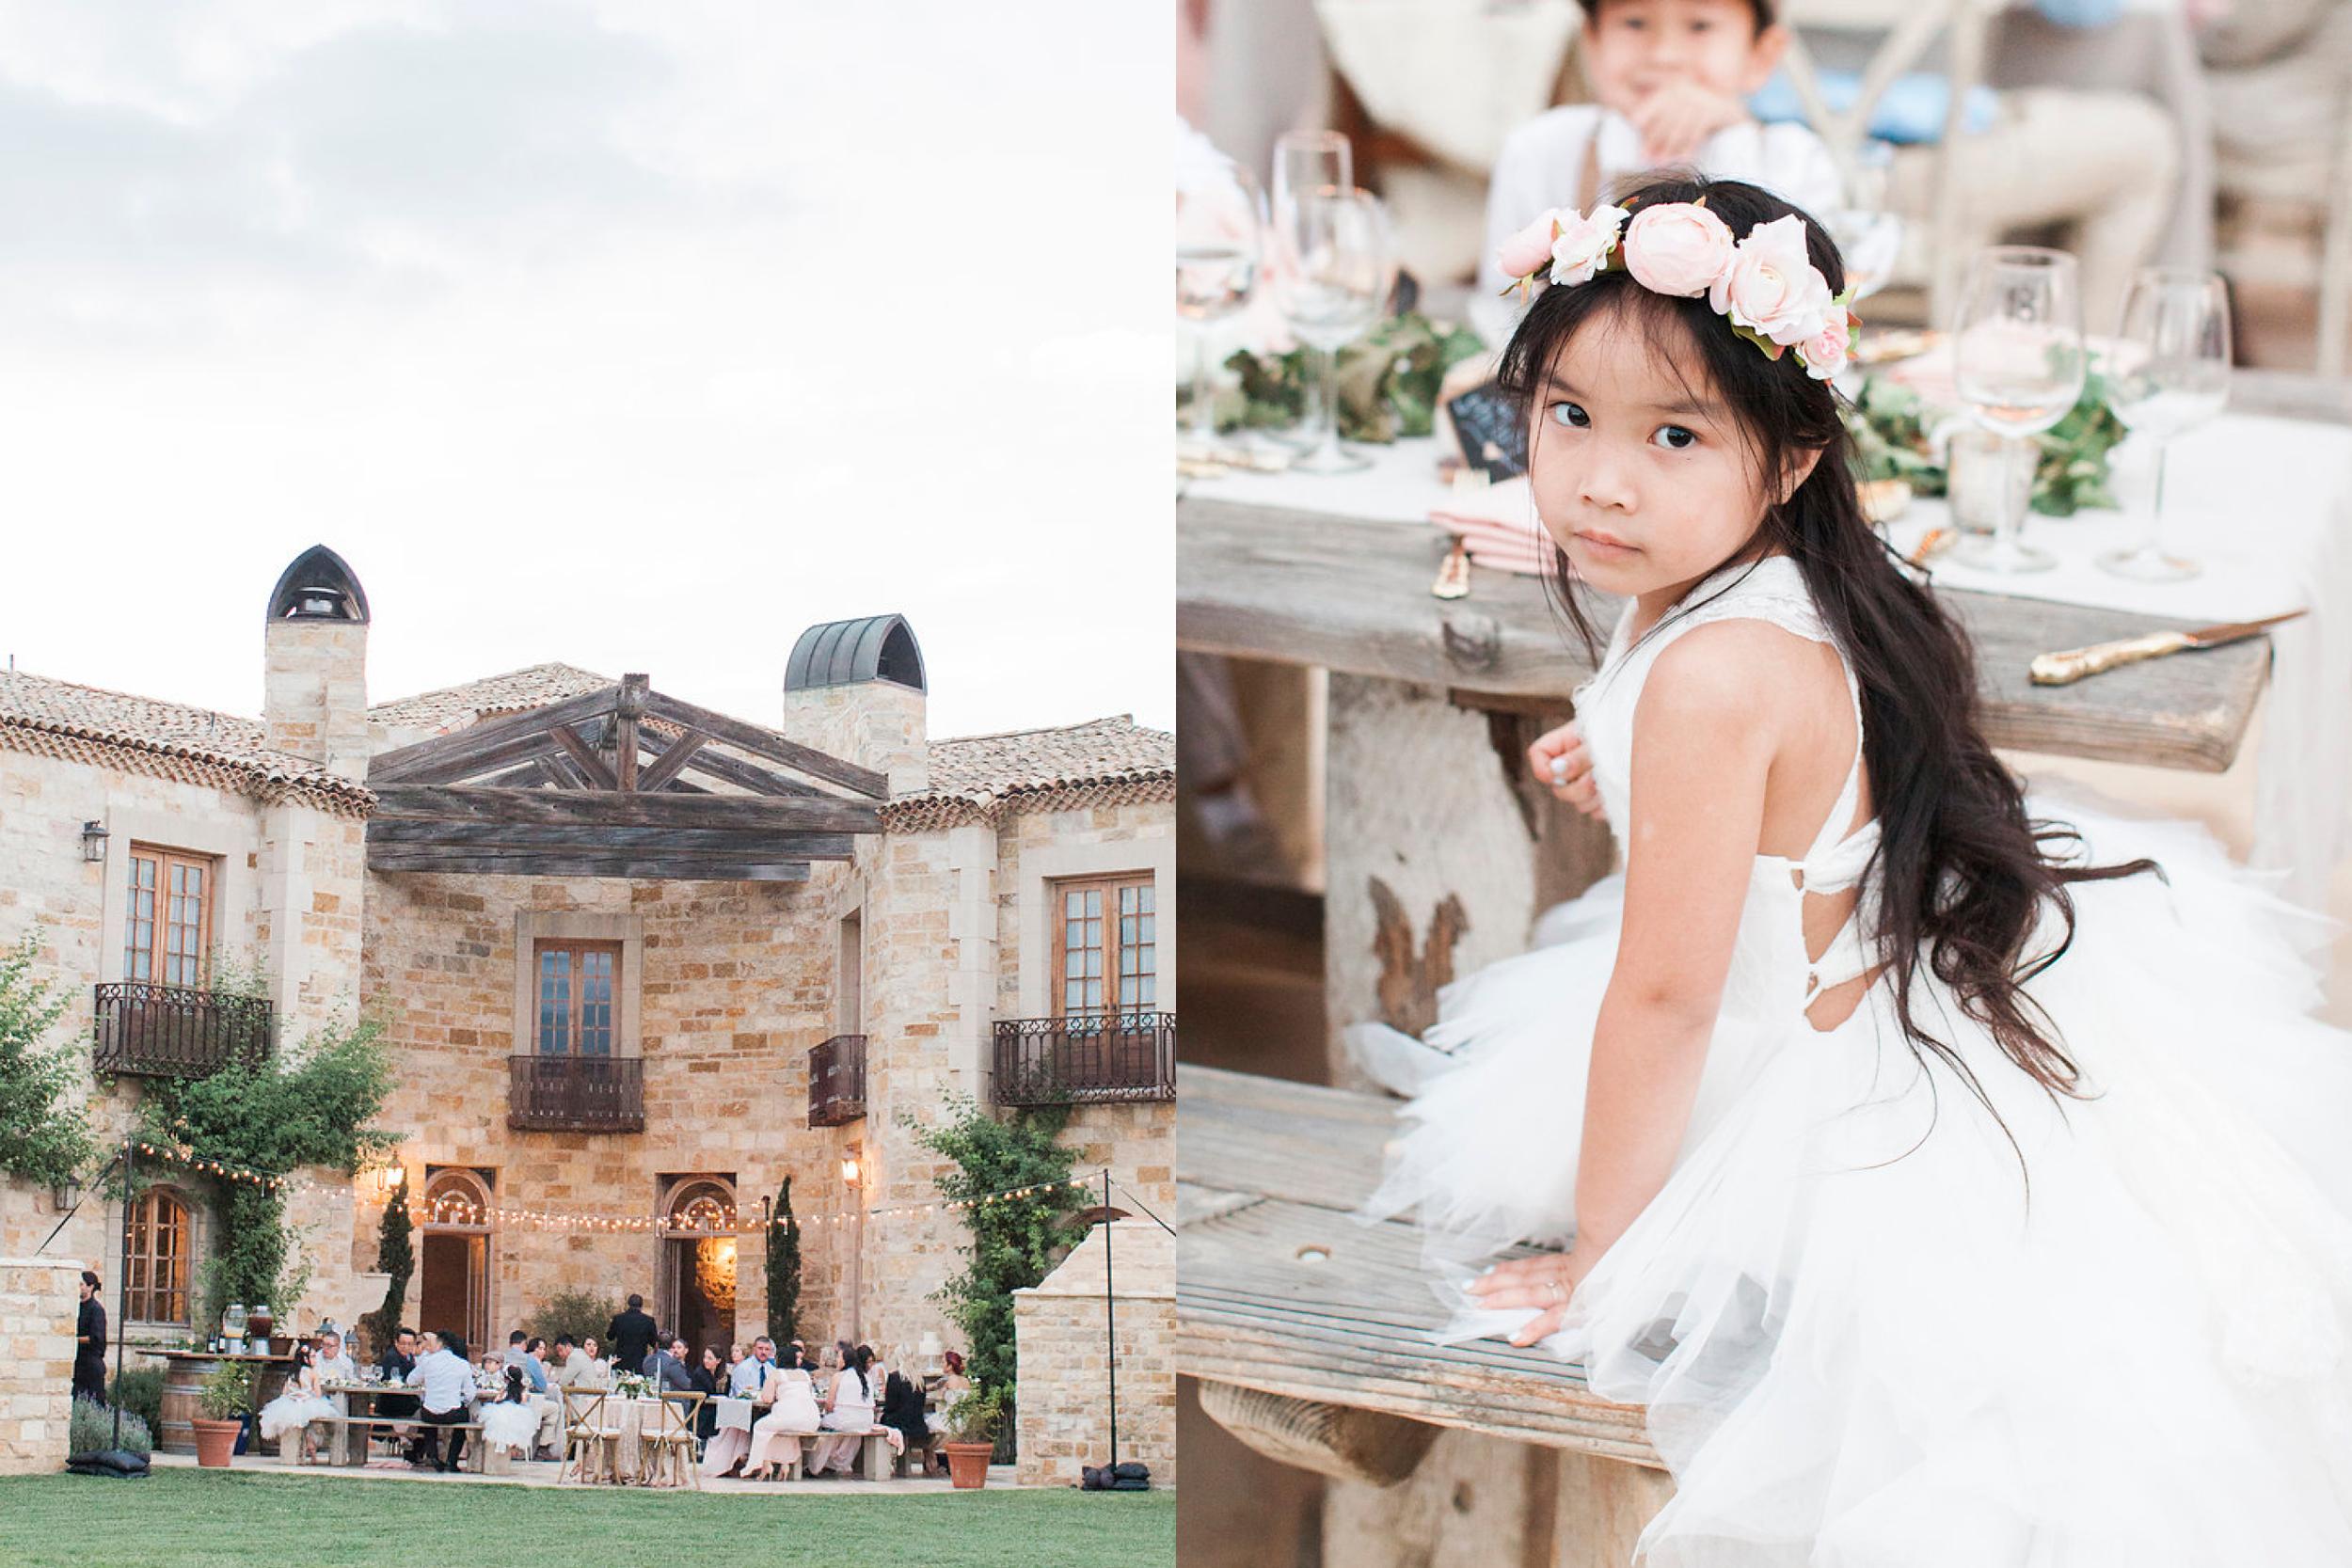 sunstone-villa-wedding-elopement-winery-courtyard-rustic-vineyard-alegria-by-design-tuscany-garland-peonies-oaktree (29).jpg